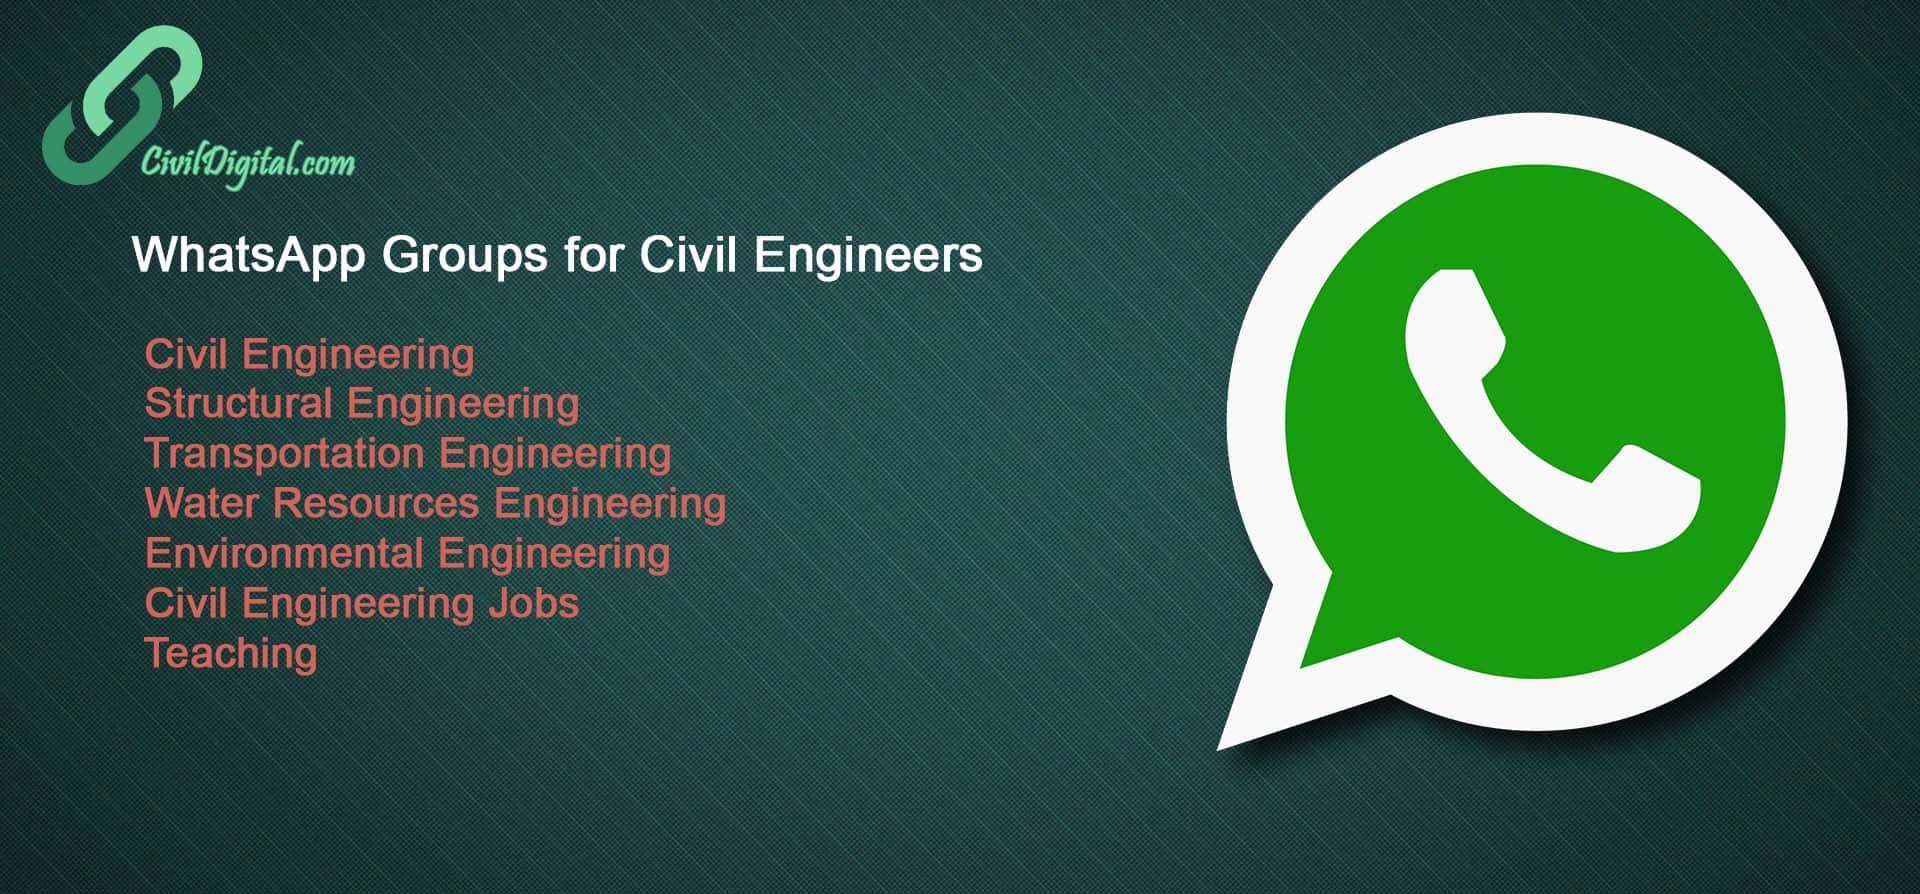 whatsapp-groups-for-civil-engineers